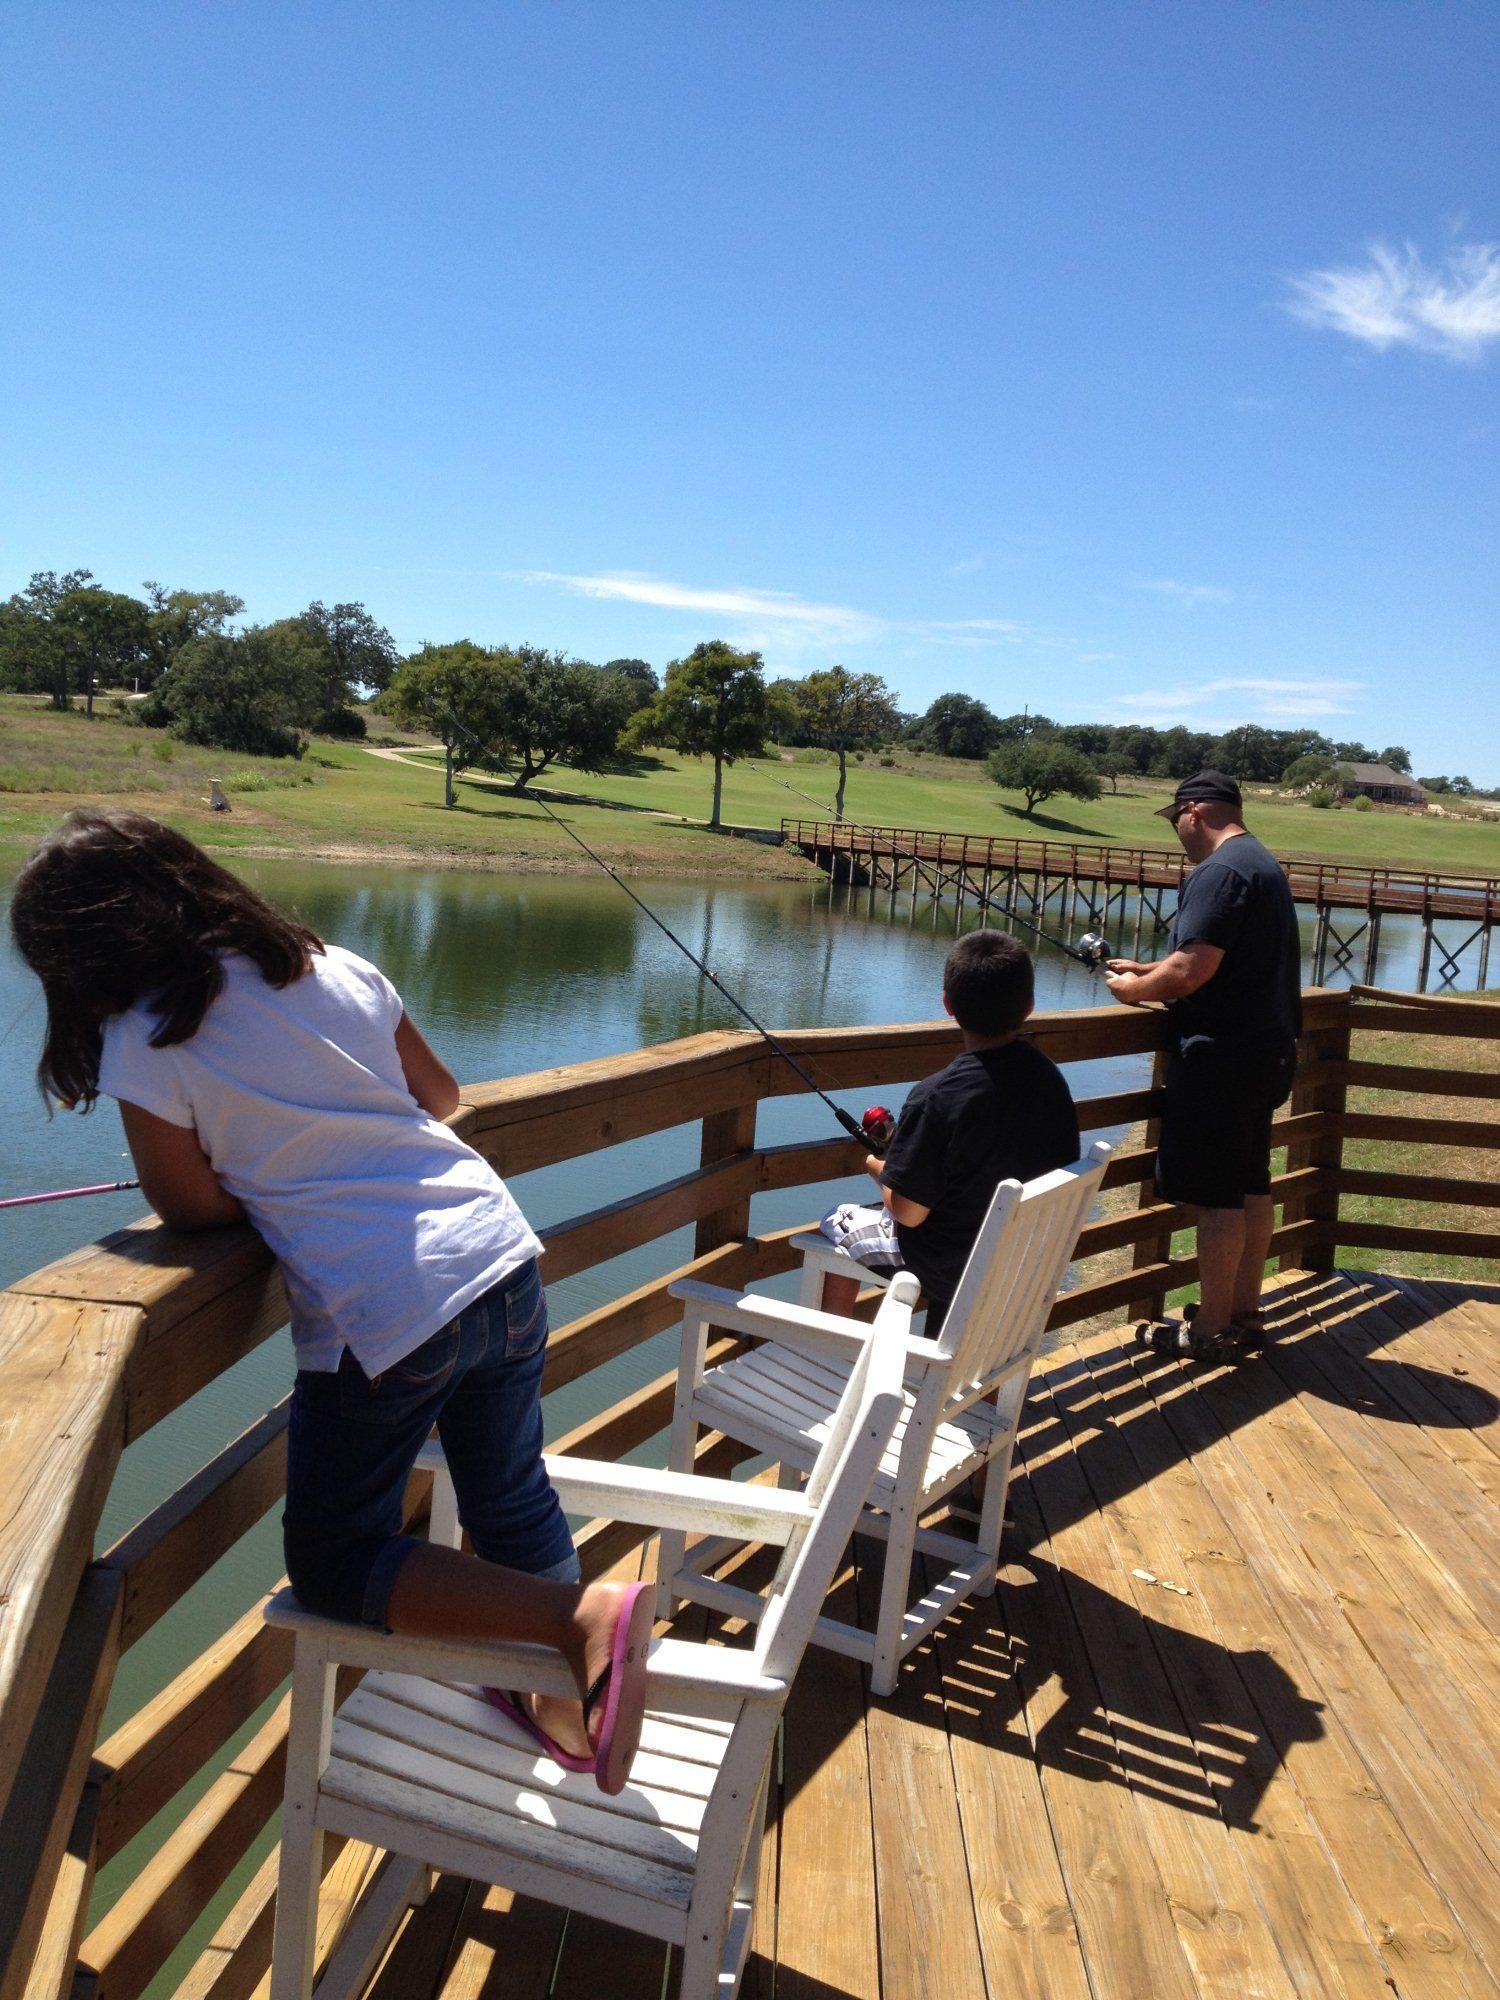 Plenty of fishing in San Antonio and surrounding area